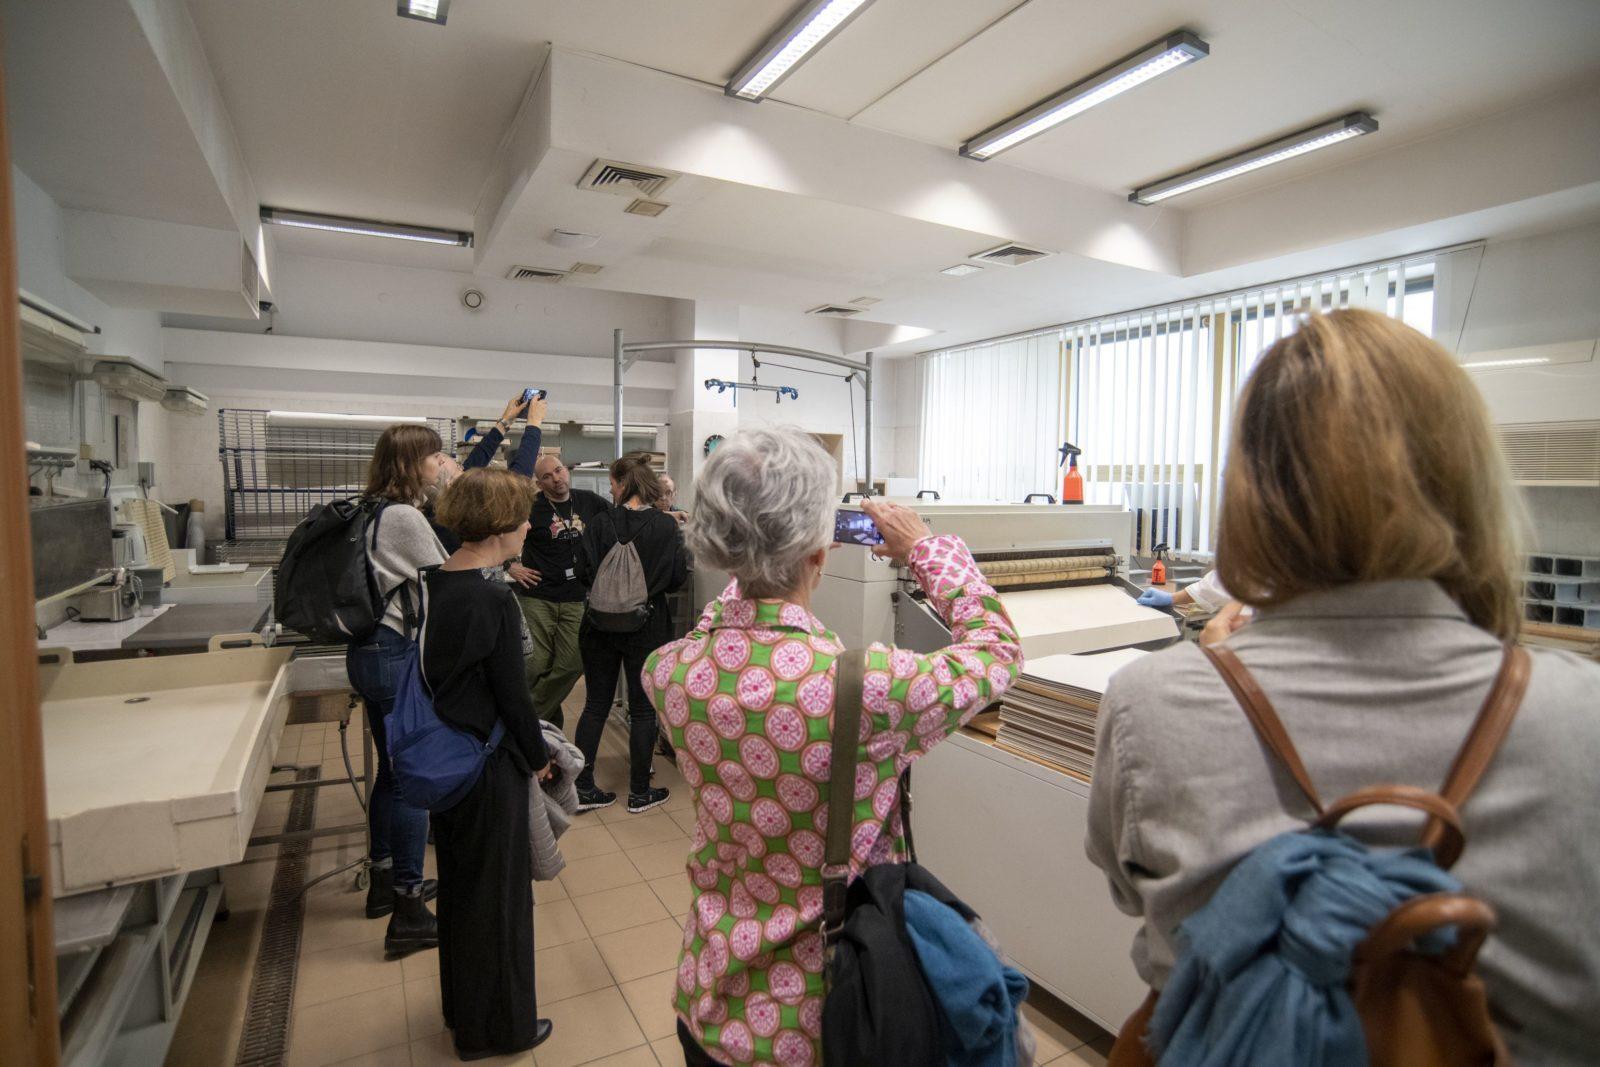 Warschau_2019_Tour_Library_of_Poland_Warsaw_Stasiuk_Konrad_134